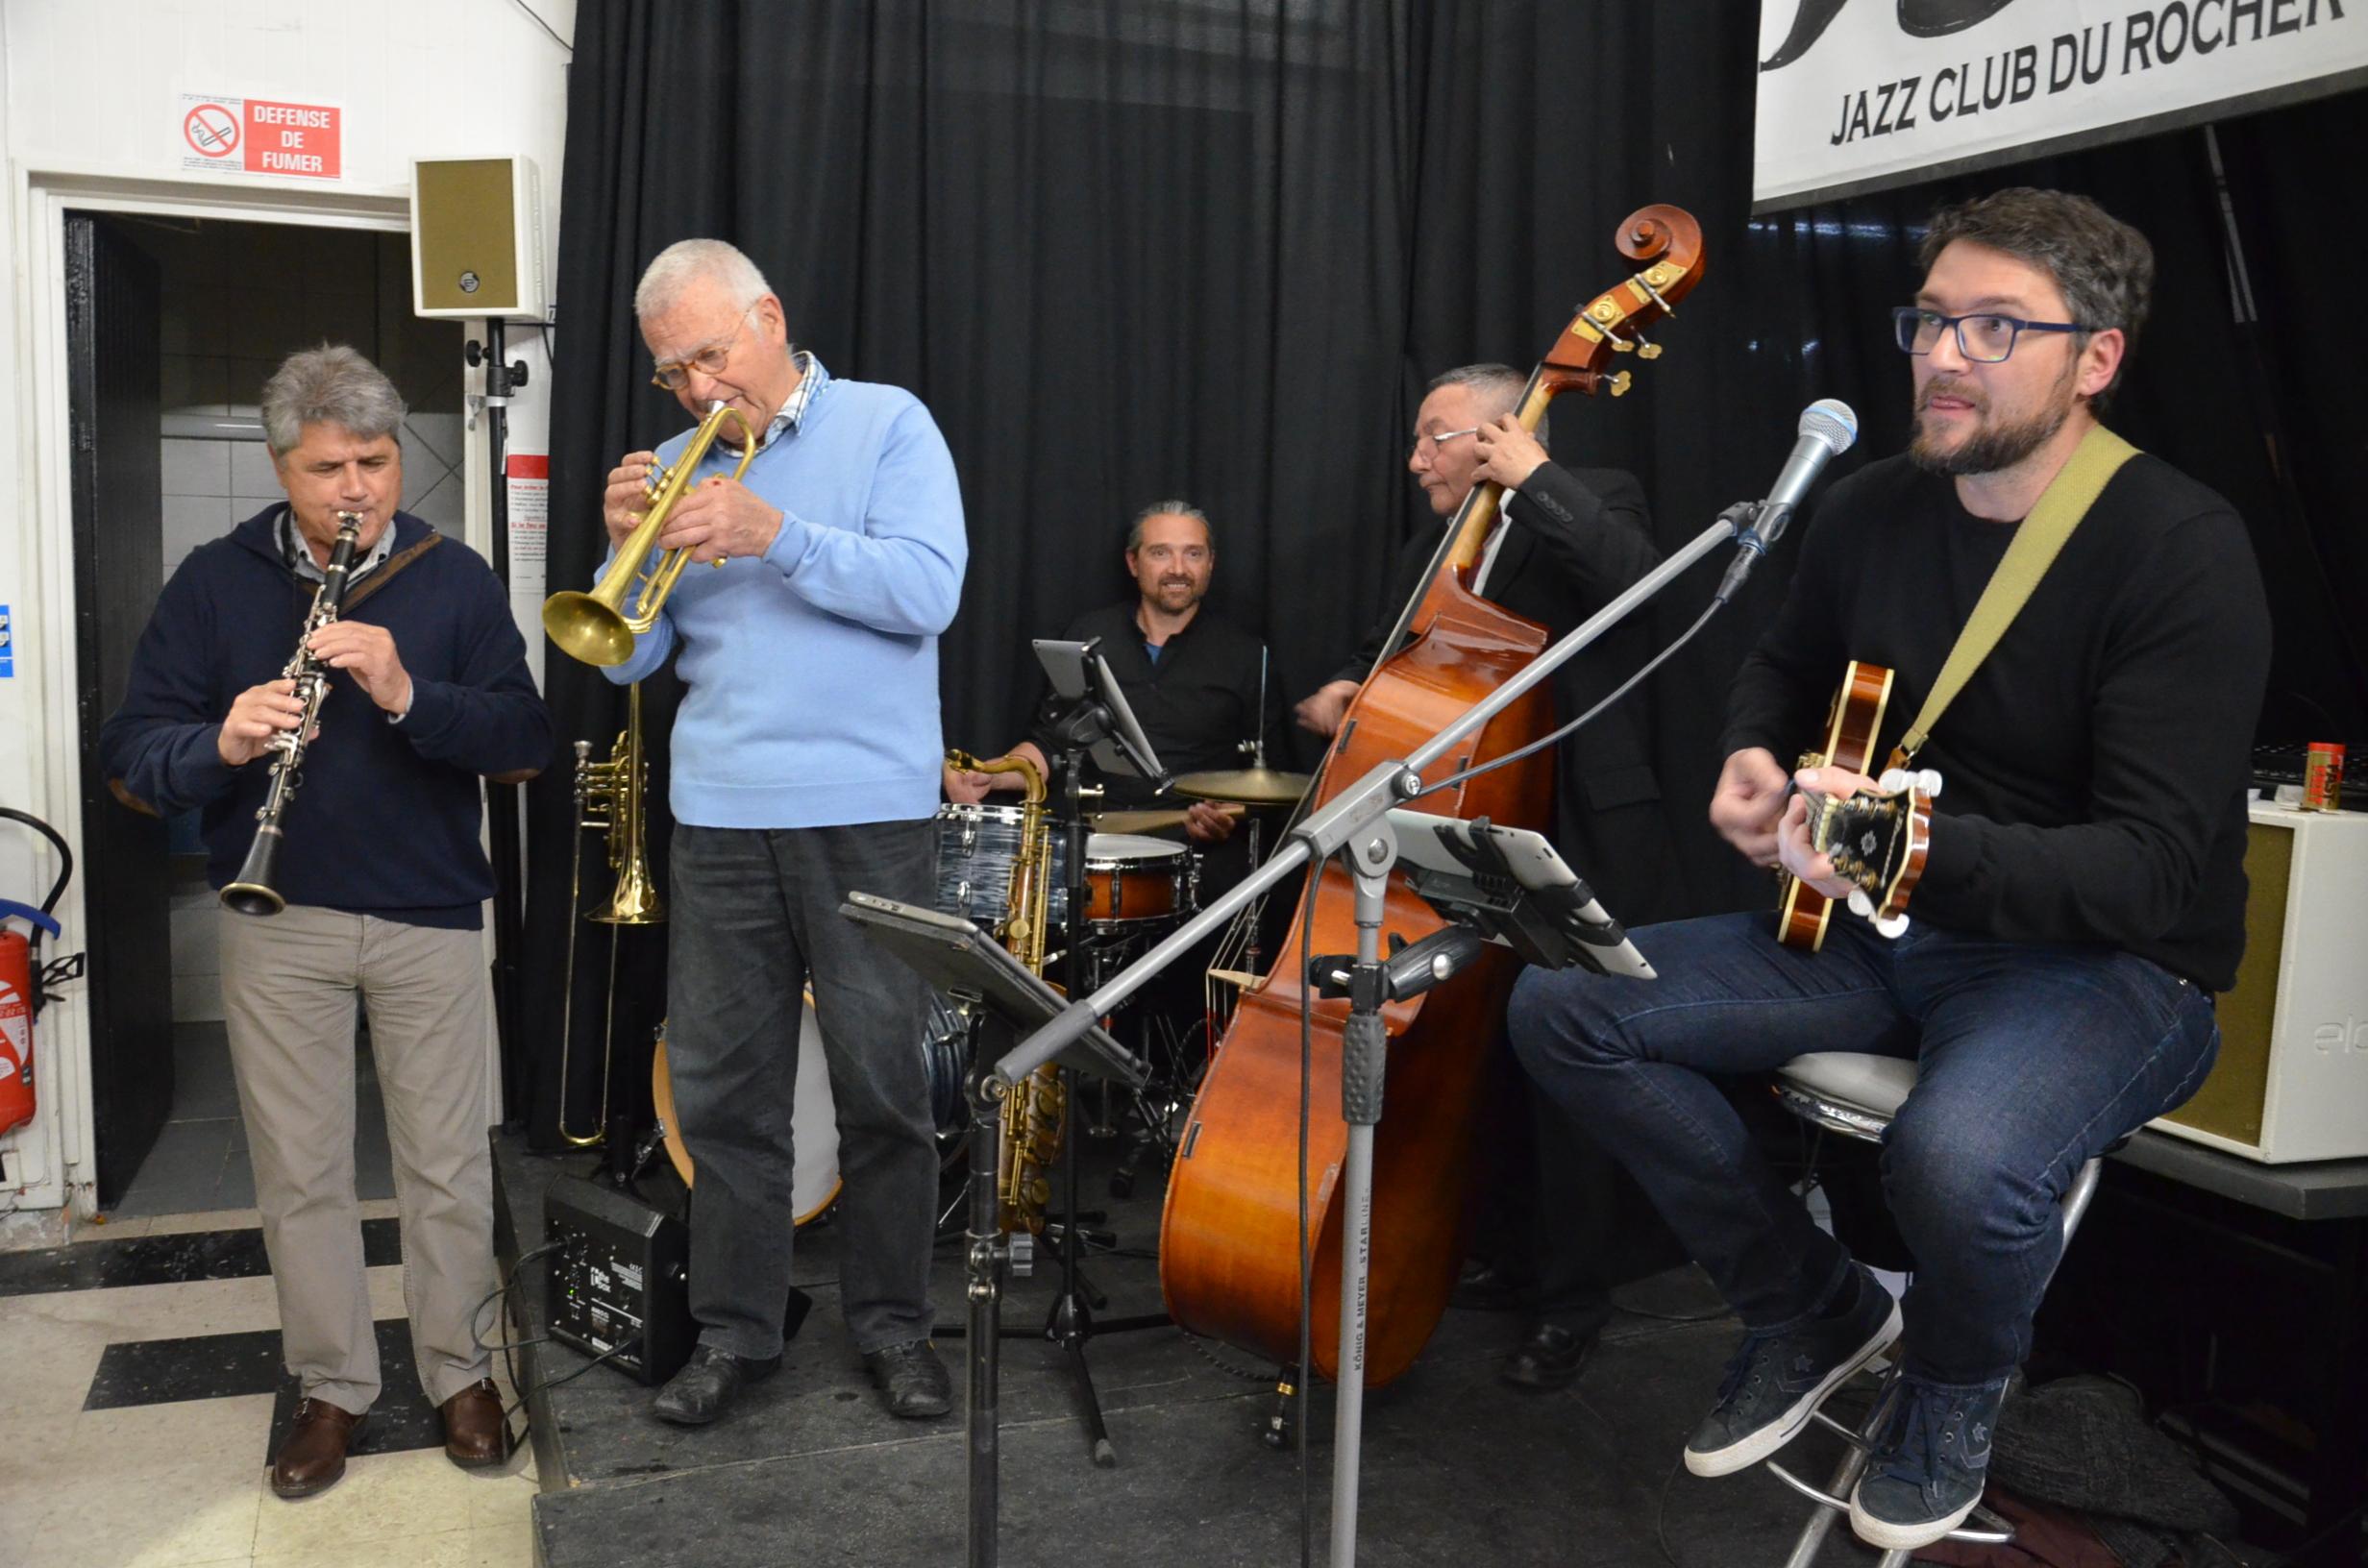 Jacques Sallent à la trompette, Michel Cabrera à la contrebasse